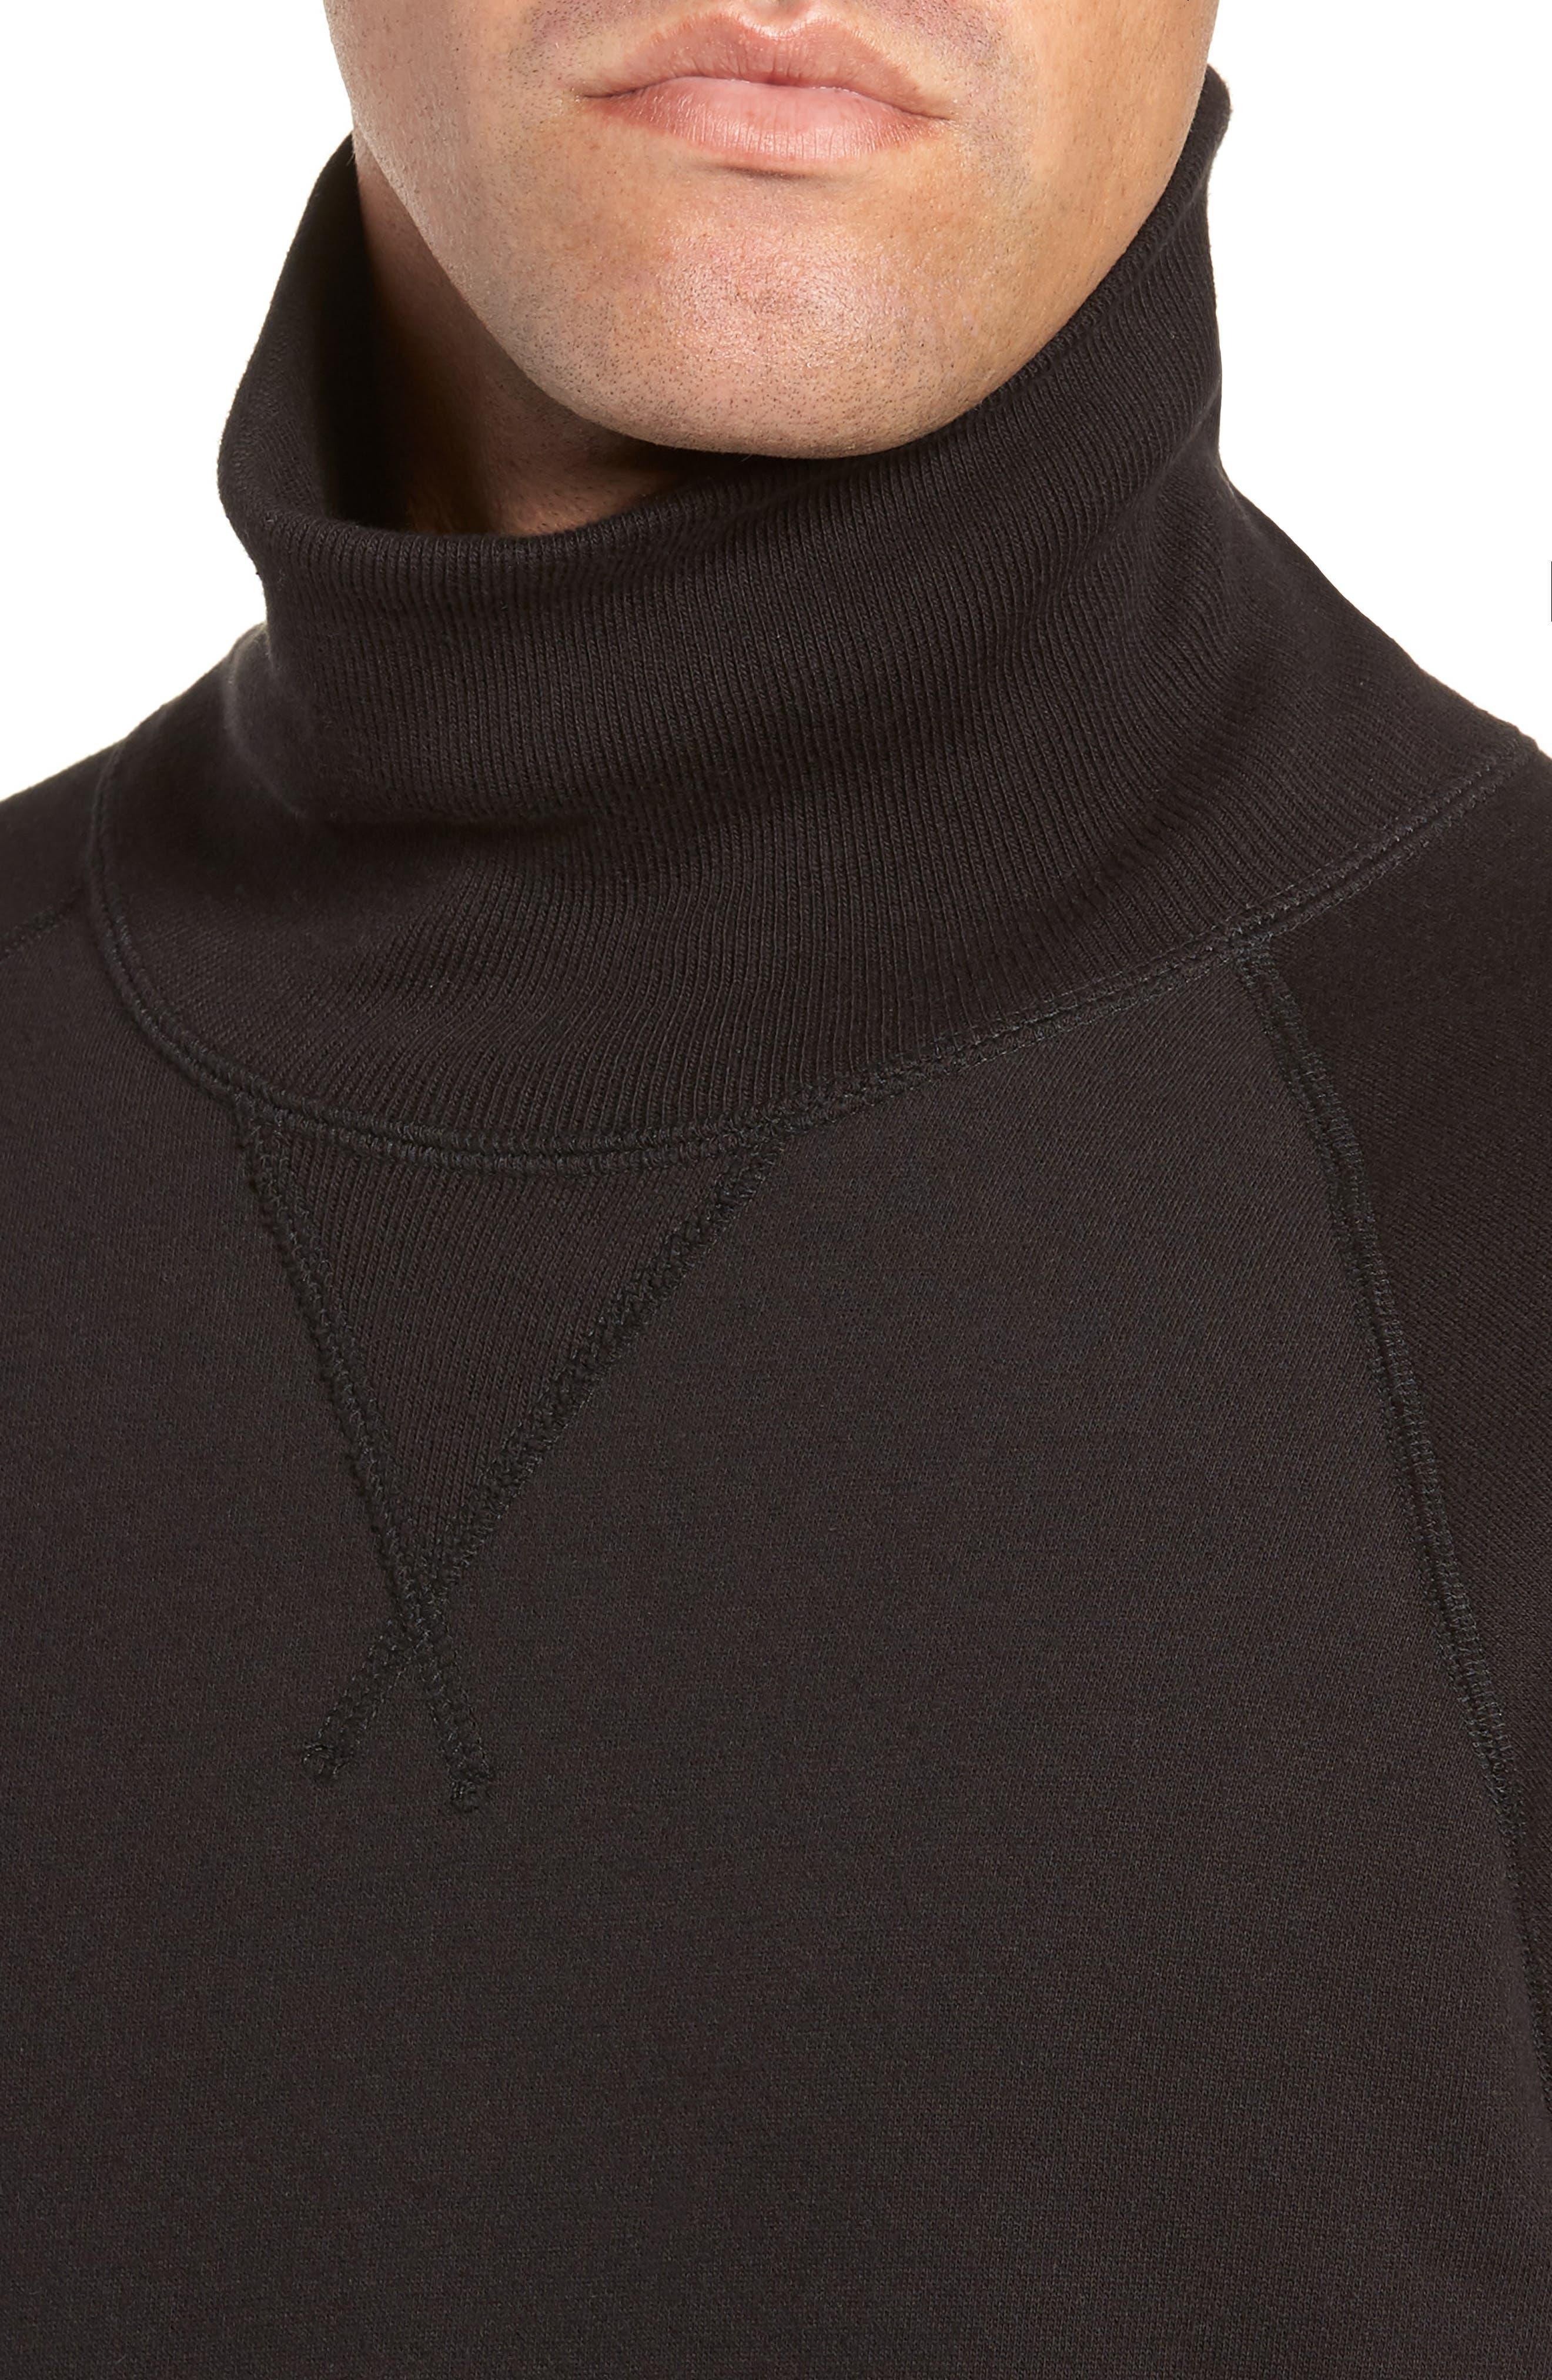 + Champion Turtleneck Sweatshirt,                             Alternate thumbnail 4, color,                             001